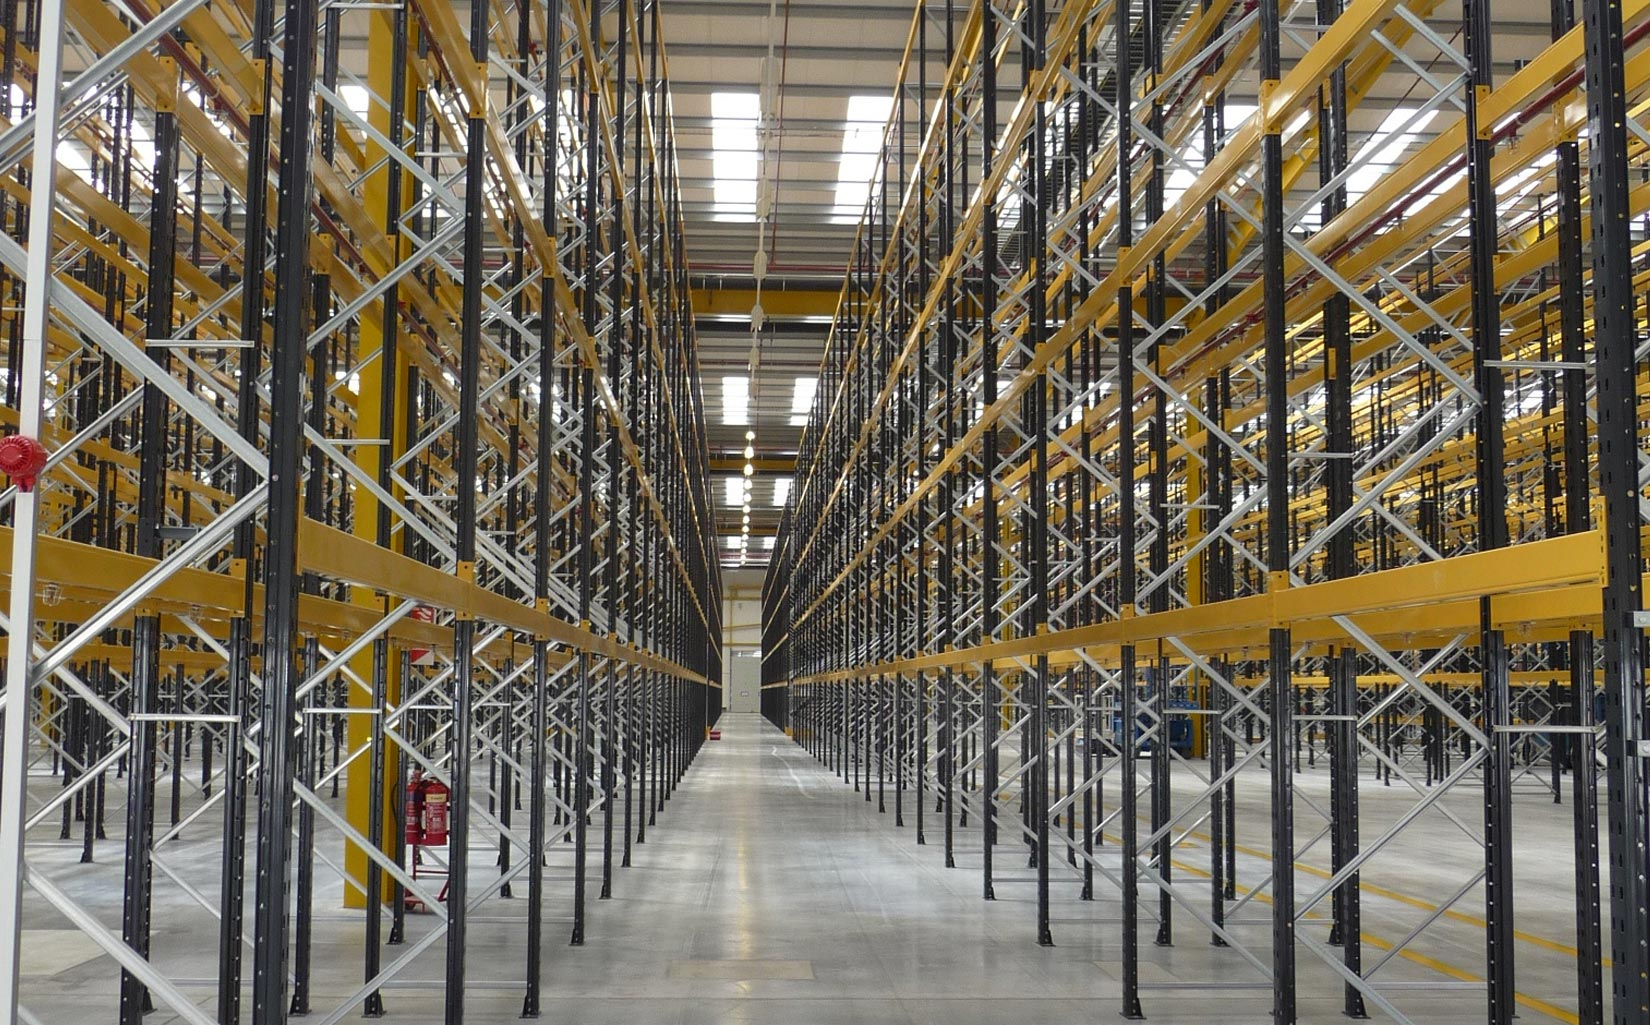 Morrisons Sittingbourne Distribution Centre, Inside the Distribution Centre